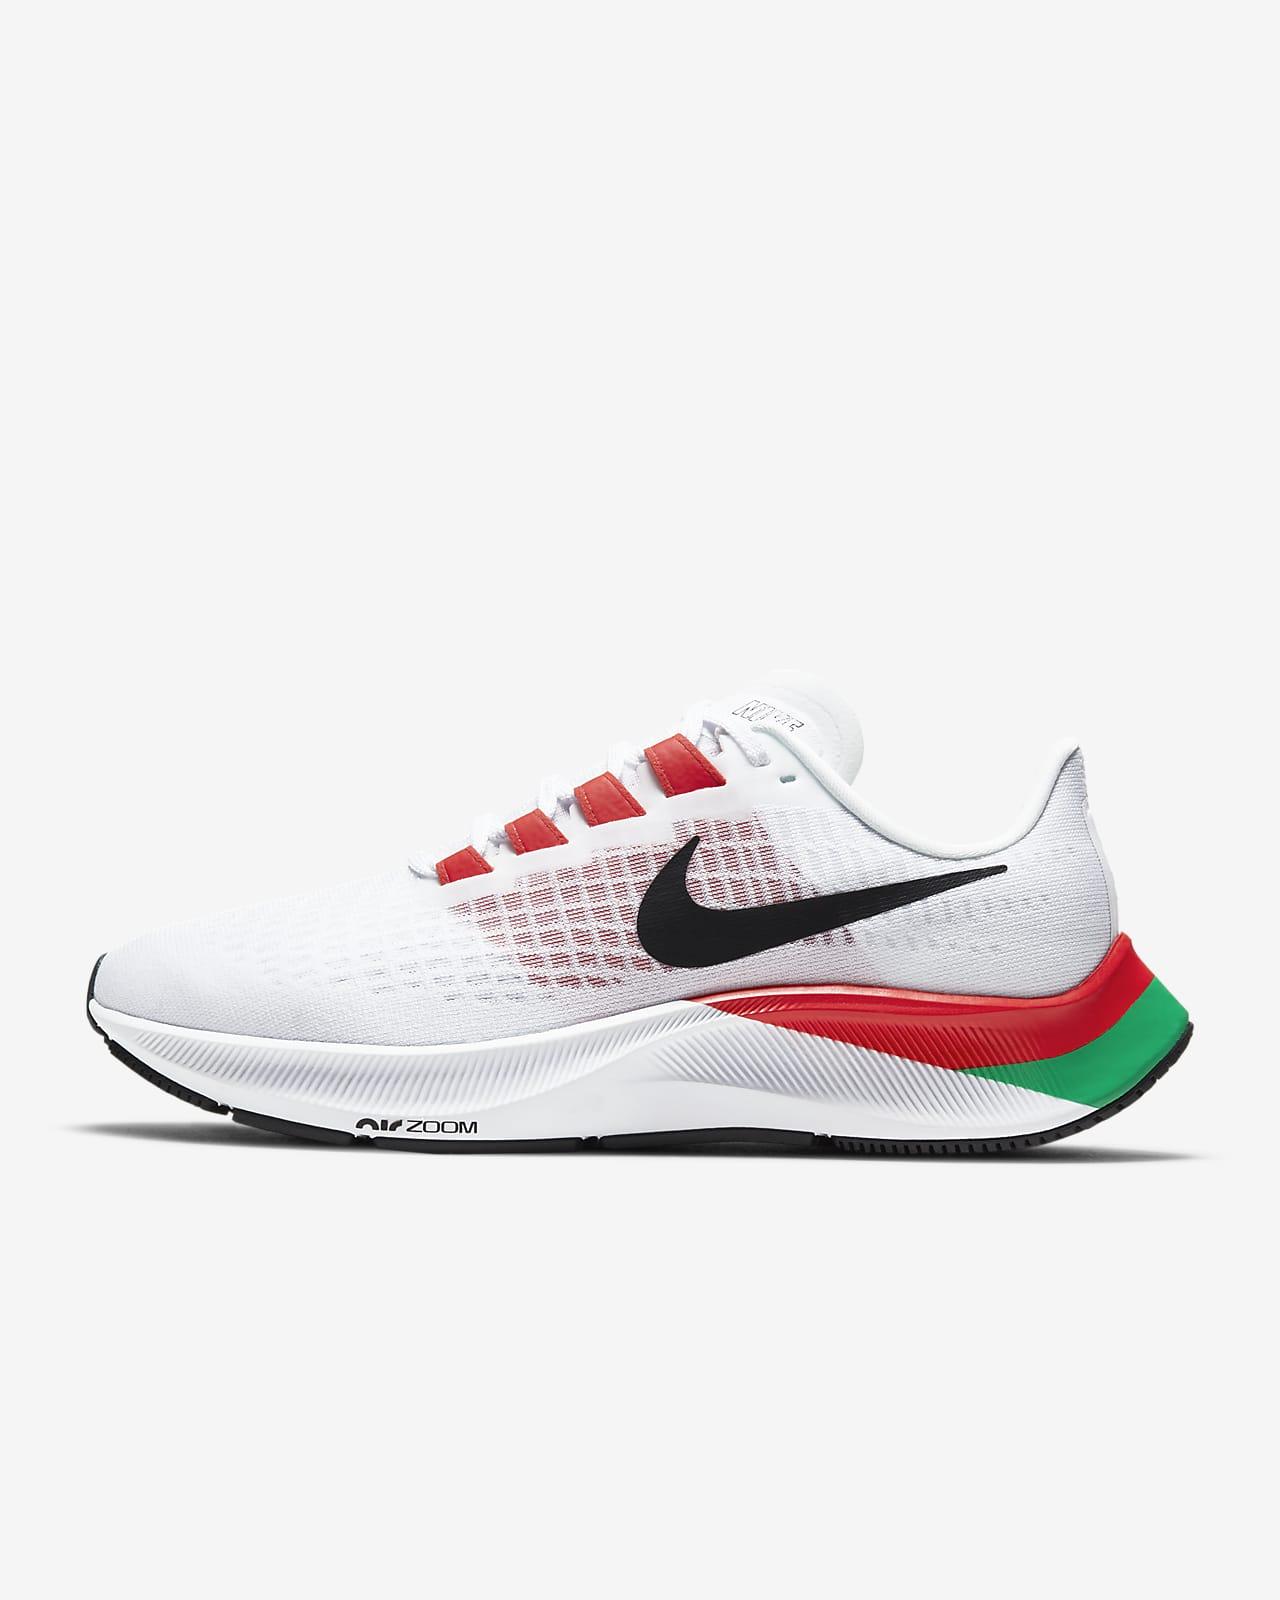 Chaussure de running Nike Air Zoom Pegasus 37 Eliud Kipchoge pour Femme